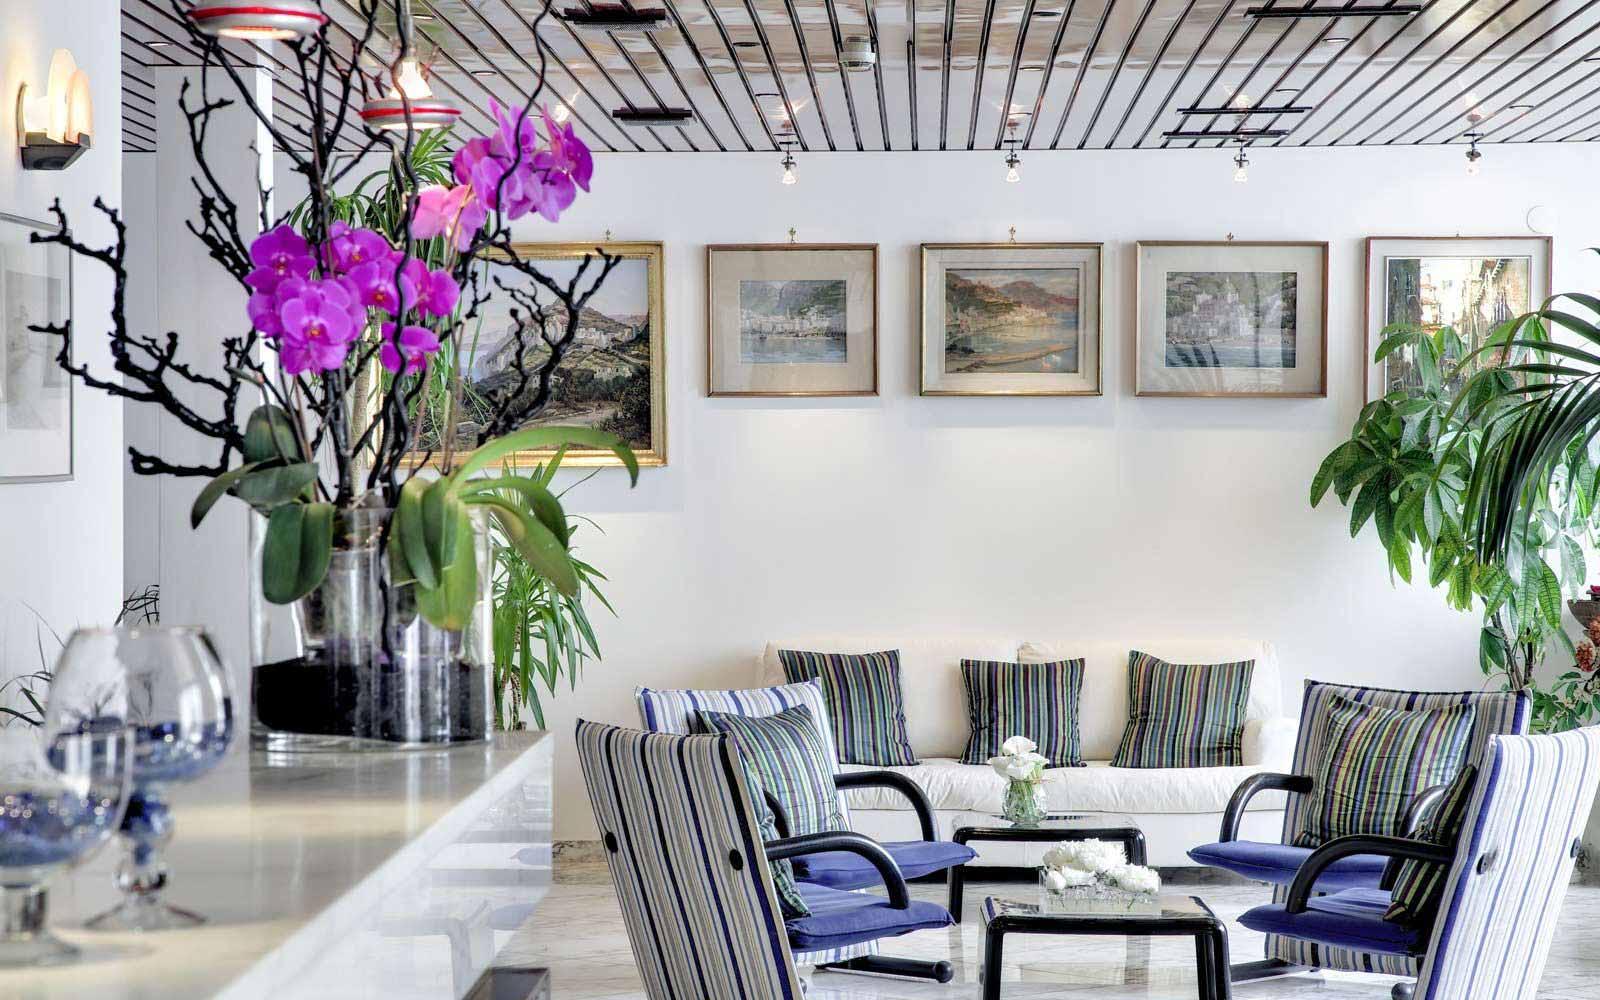 Lobby at Hotel Miramalfi